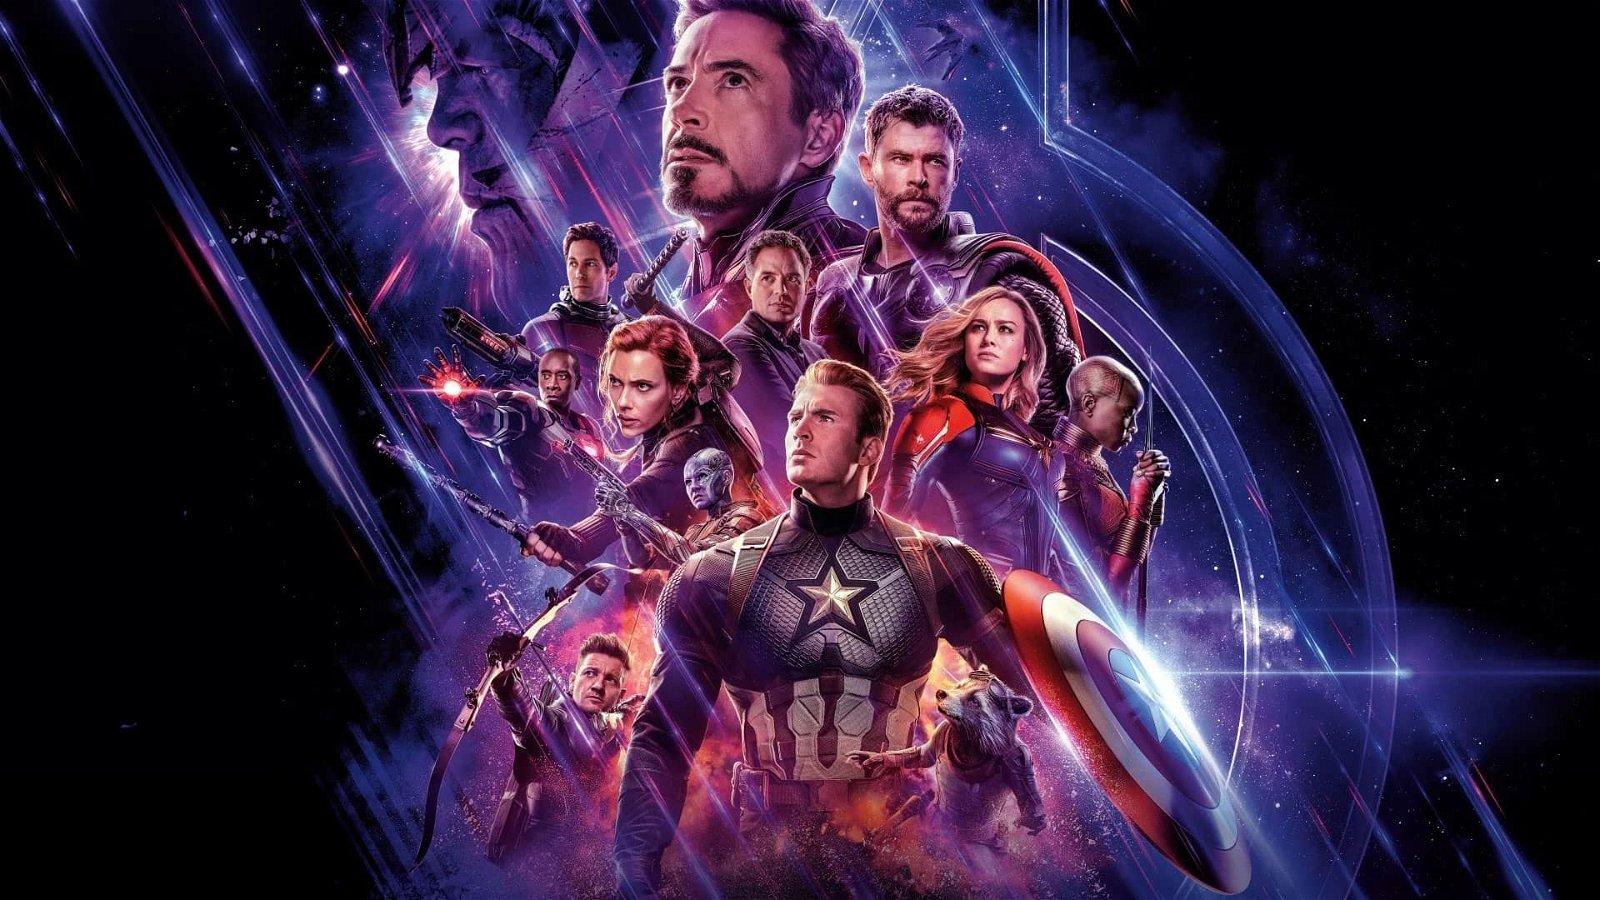 Marvel Releases All Post-Credit Scenes Ahead Of Avengers Endgame 1